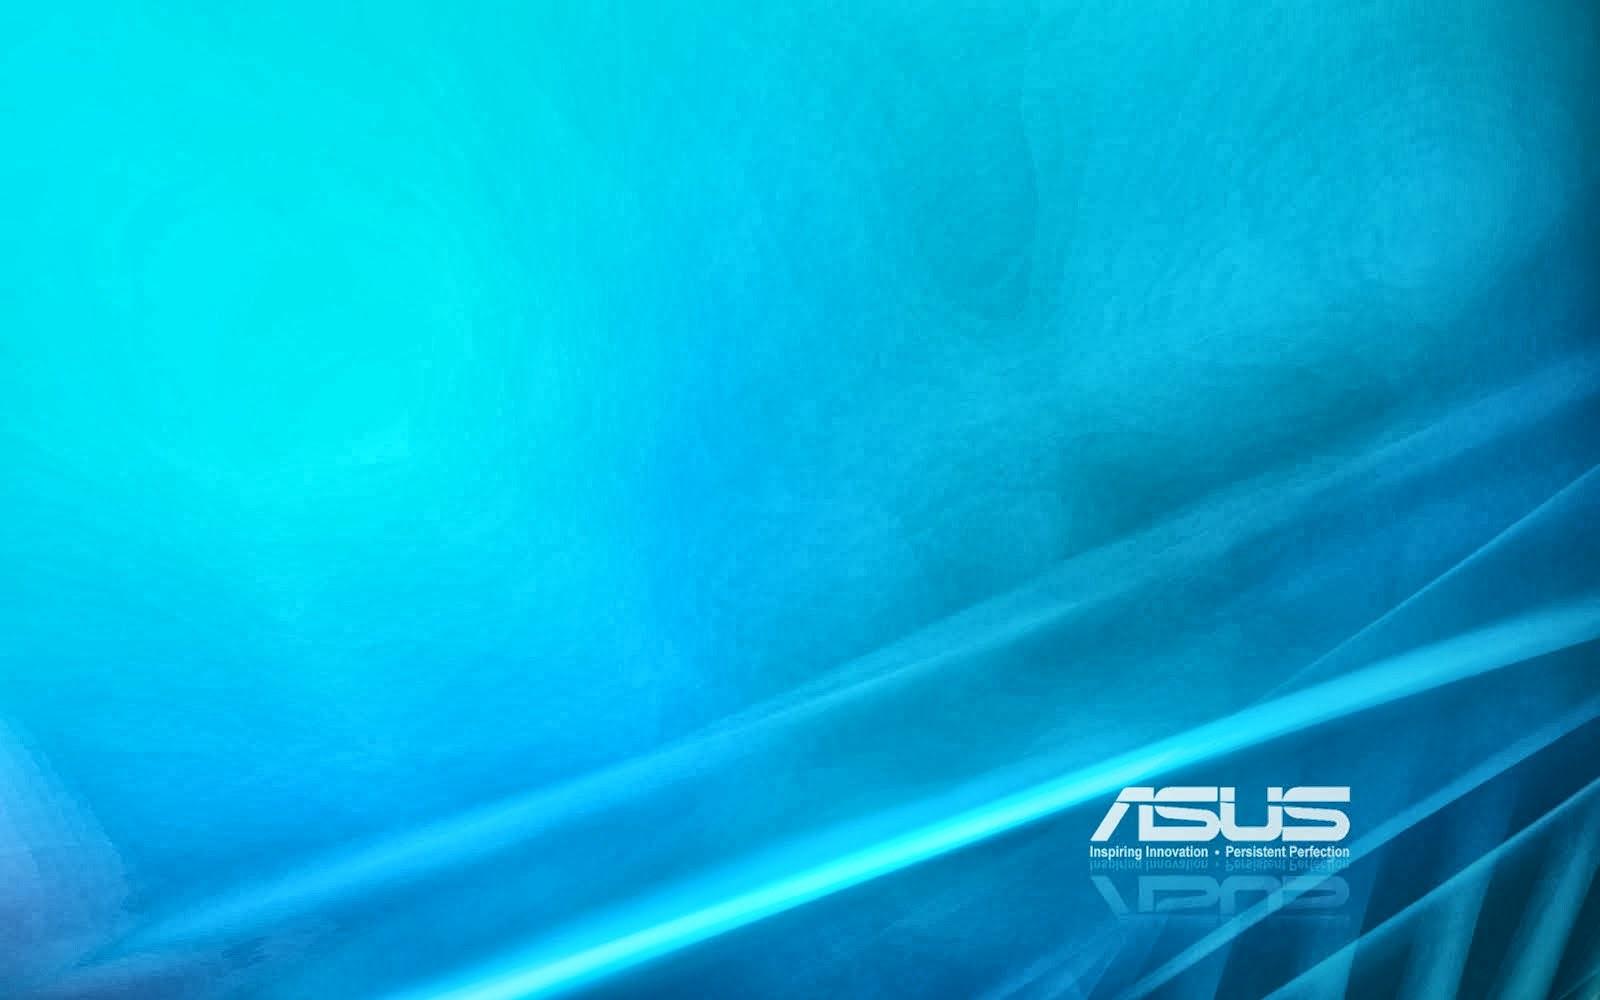 Asus Wallpaper Hd: FREE HD WALLPAPERS